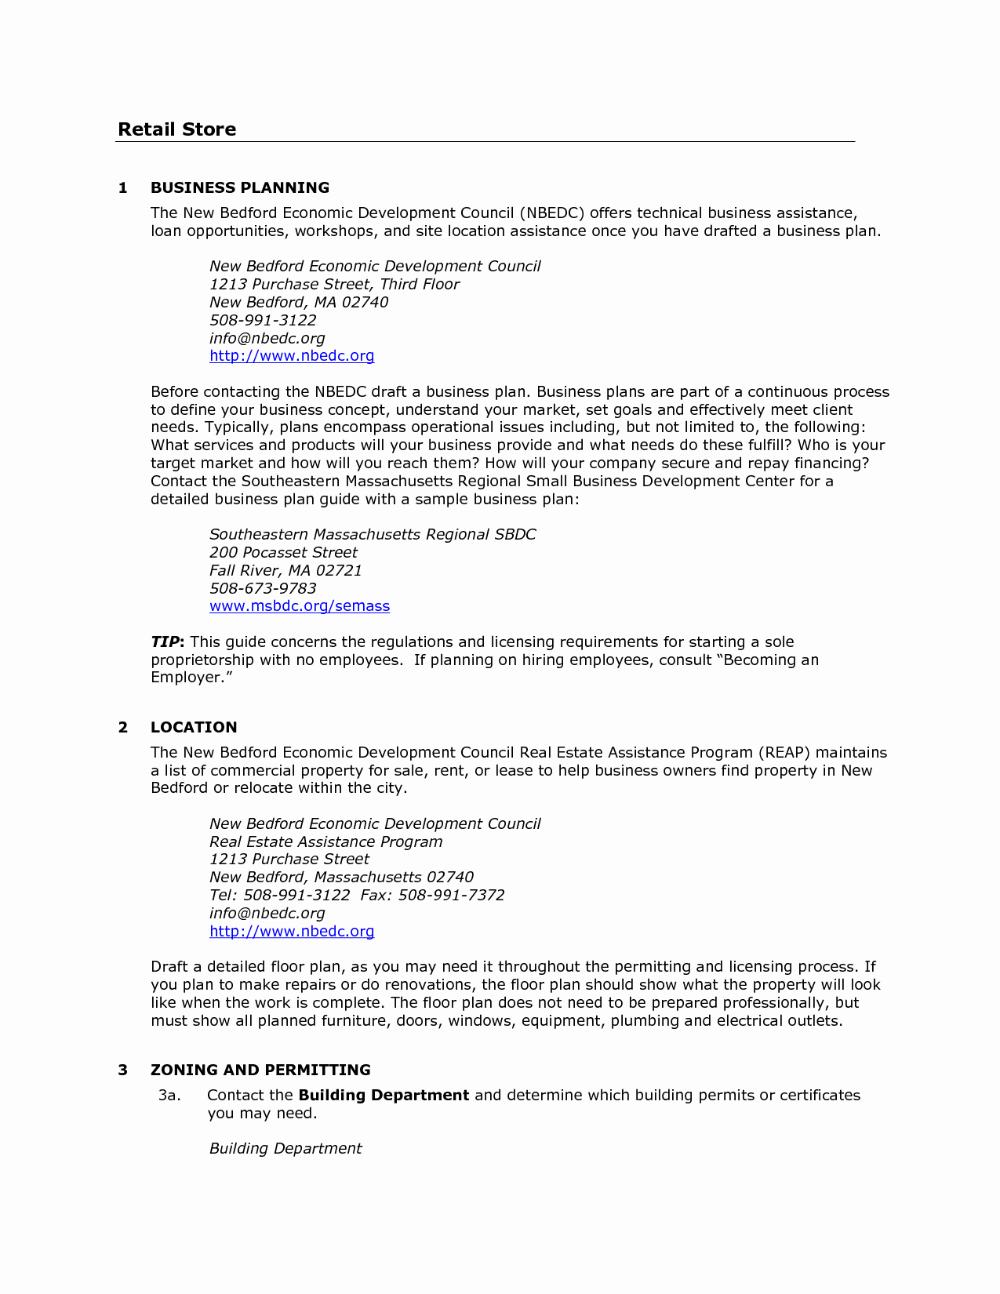 Sample Of Retail Business Plan Guiaubuntupt For Retail Business Proposal Retail Business Plan Template Business Plan Template Free Business Proposal Template